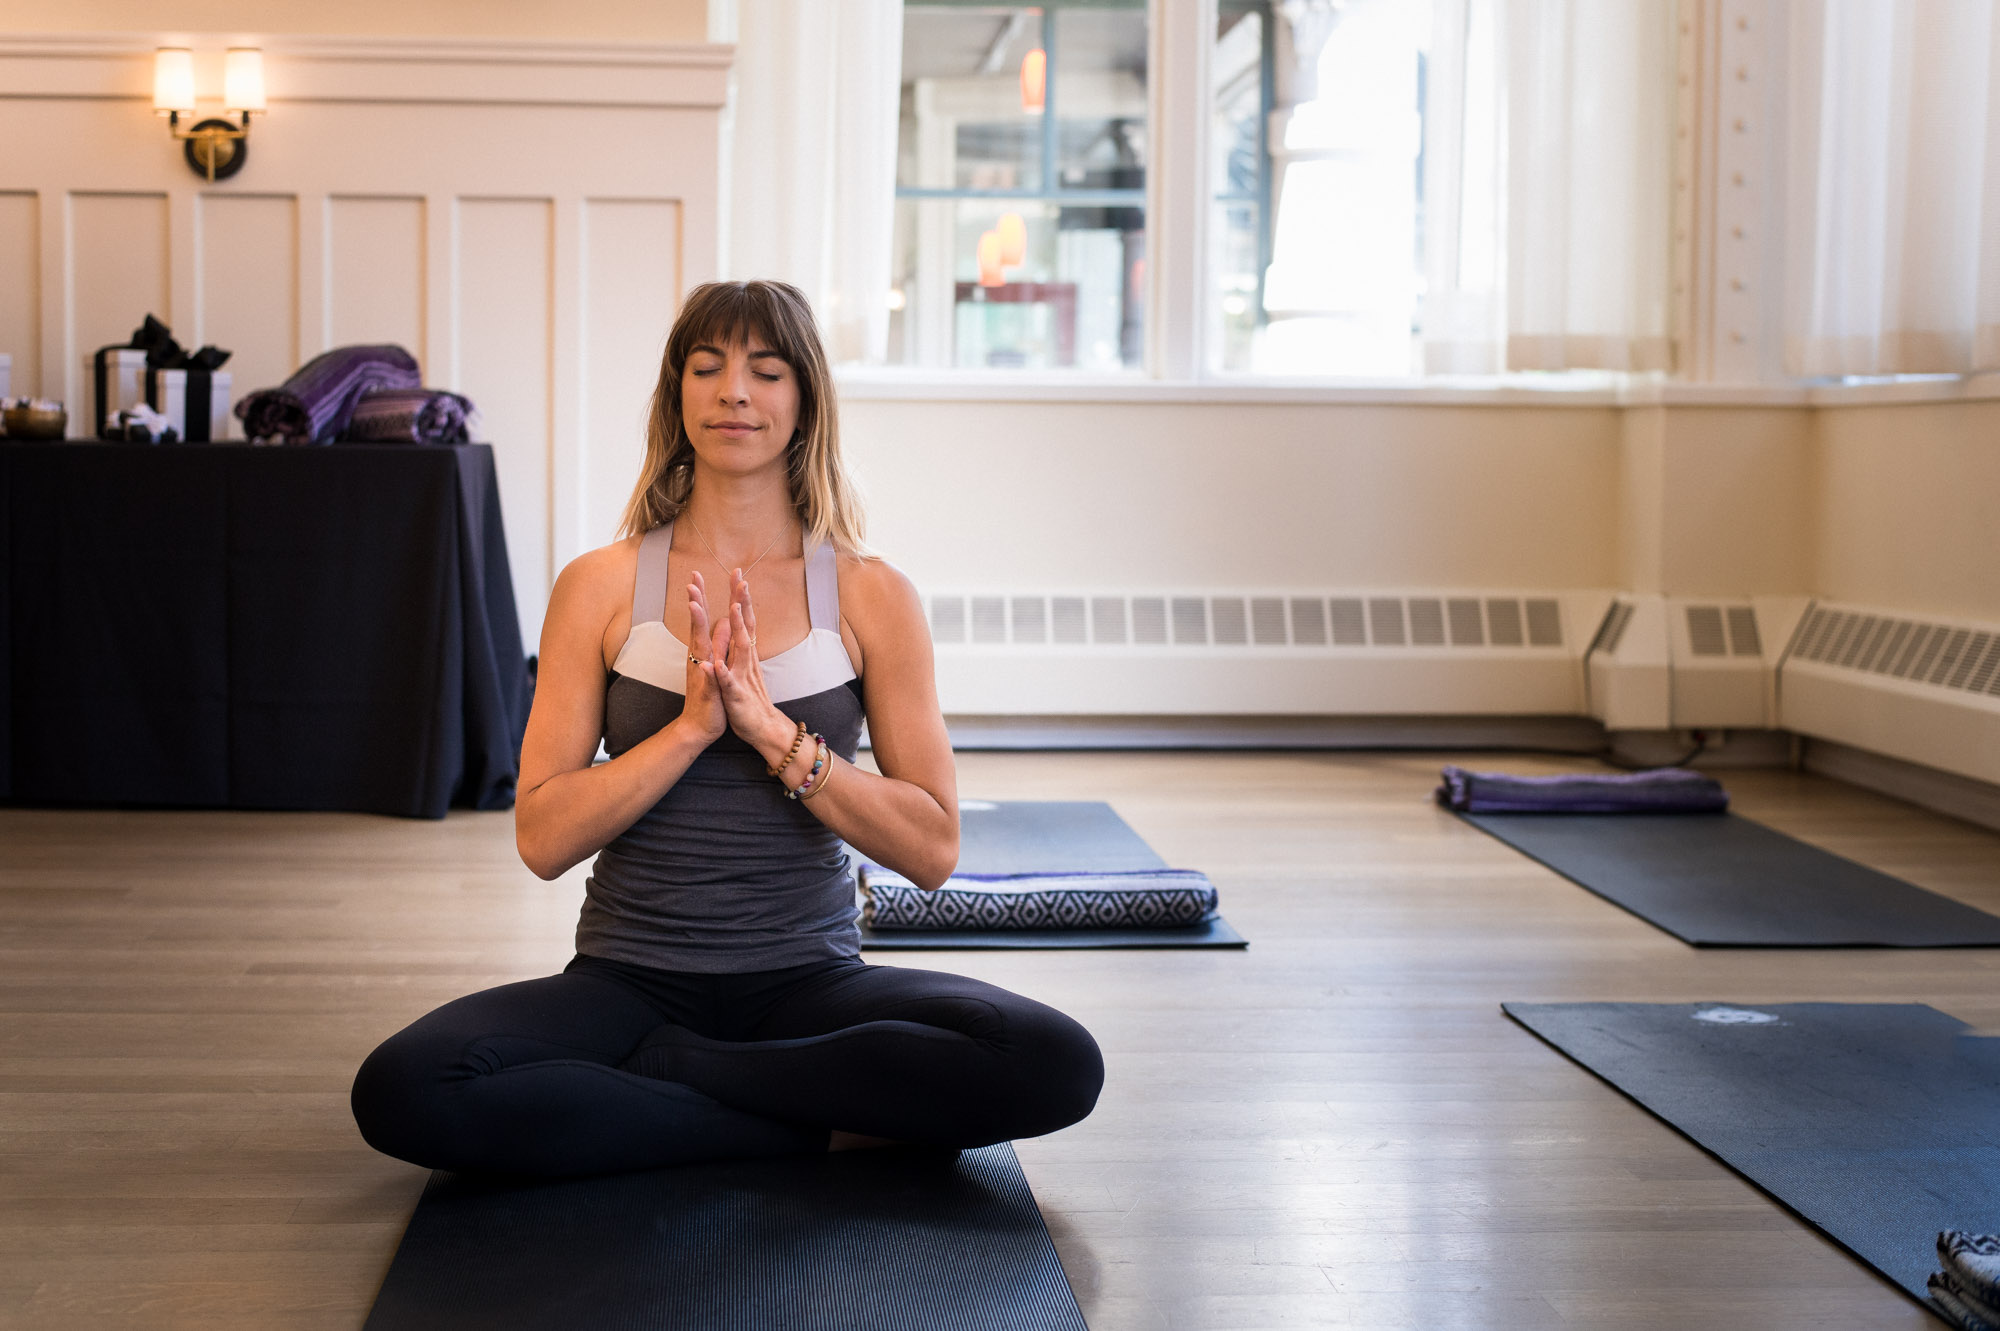 Women's Lifestyle Blog highlighting self-care through yoga